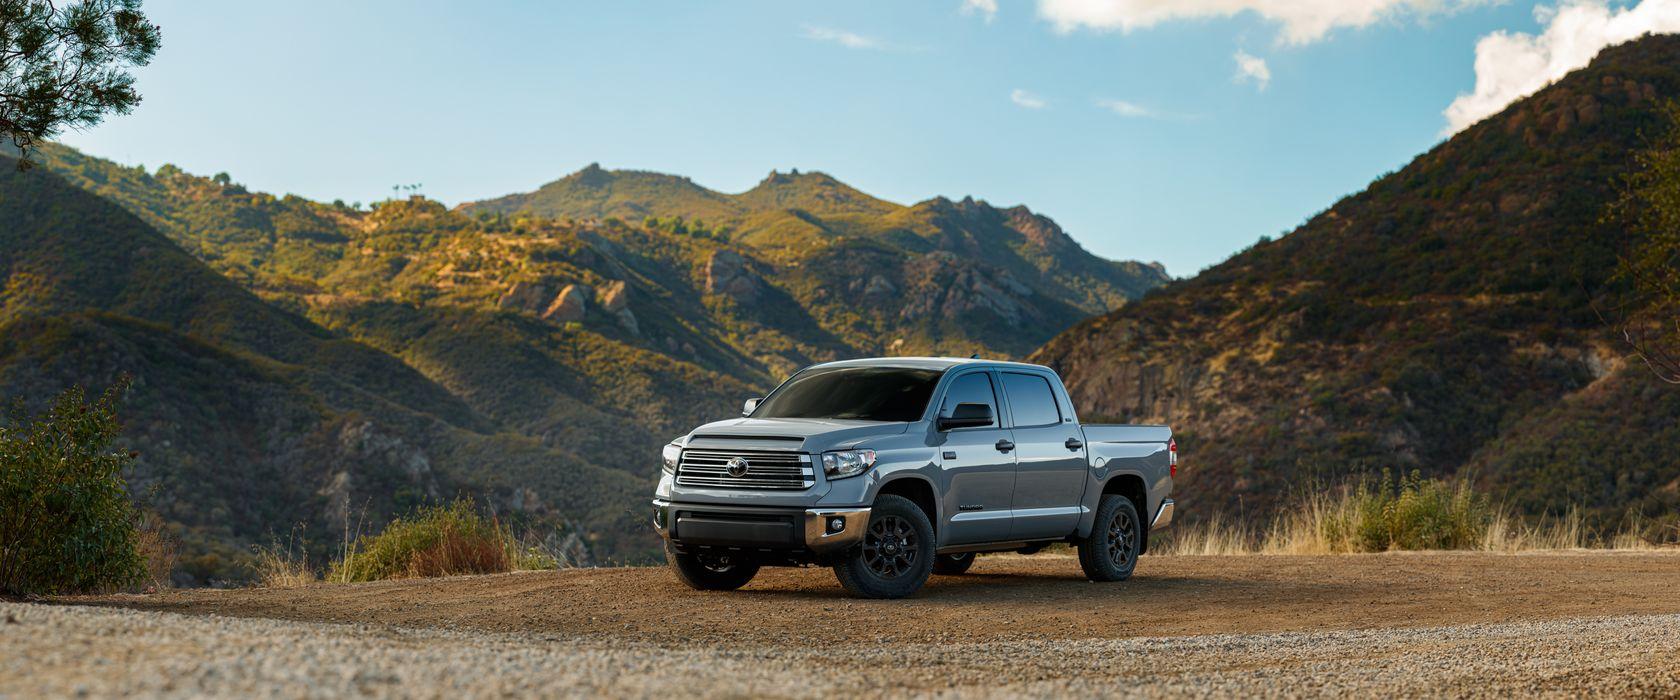 2021 Toyota Tundra Trail Edition 001